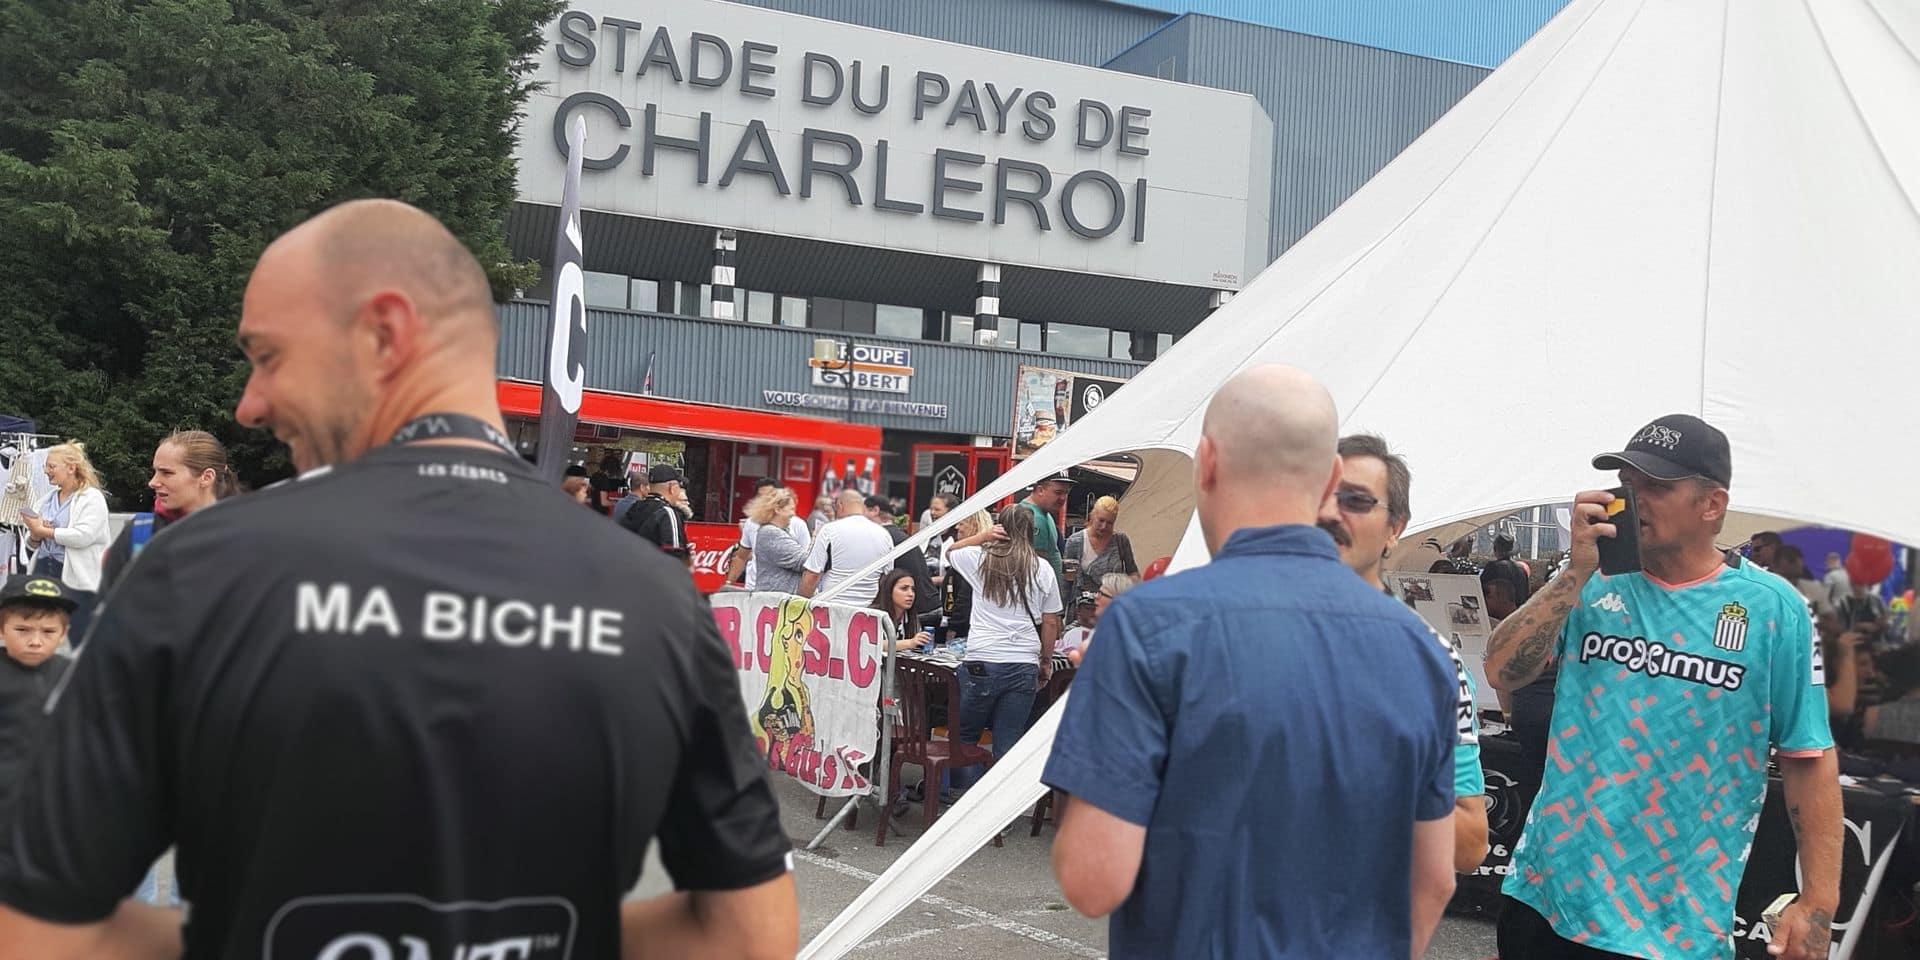 Charleroi : le fan day du Sporting attire les foules